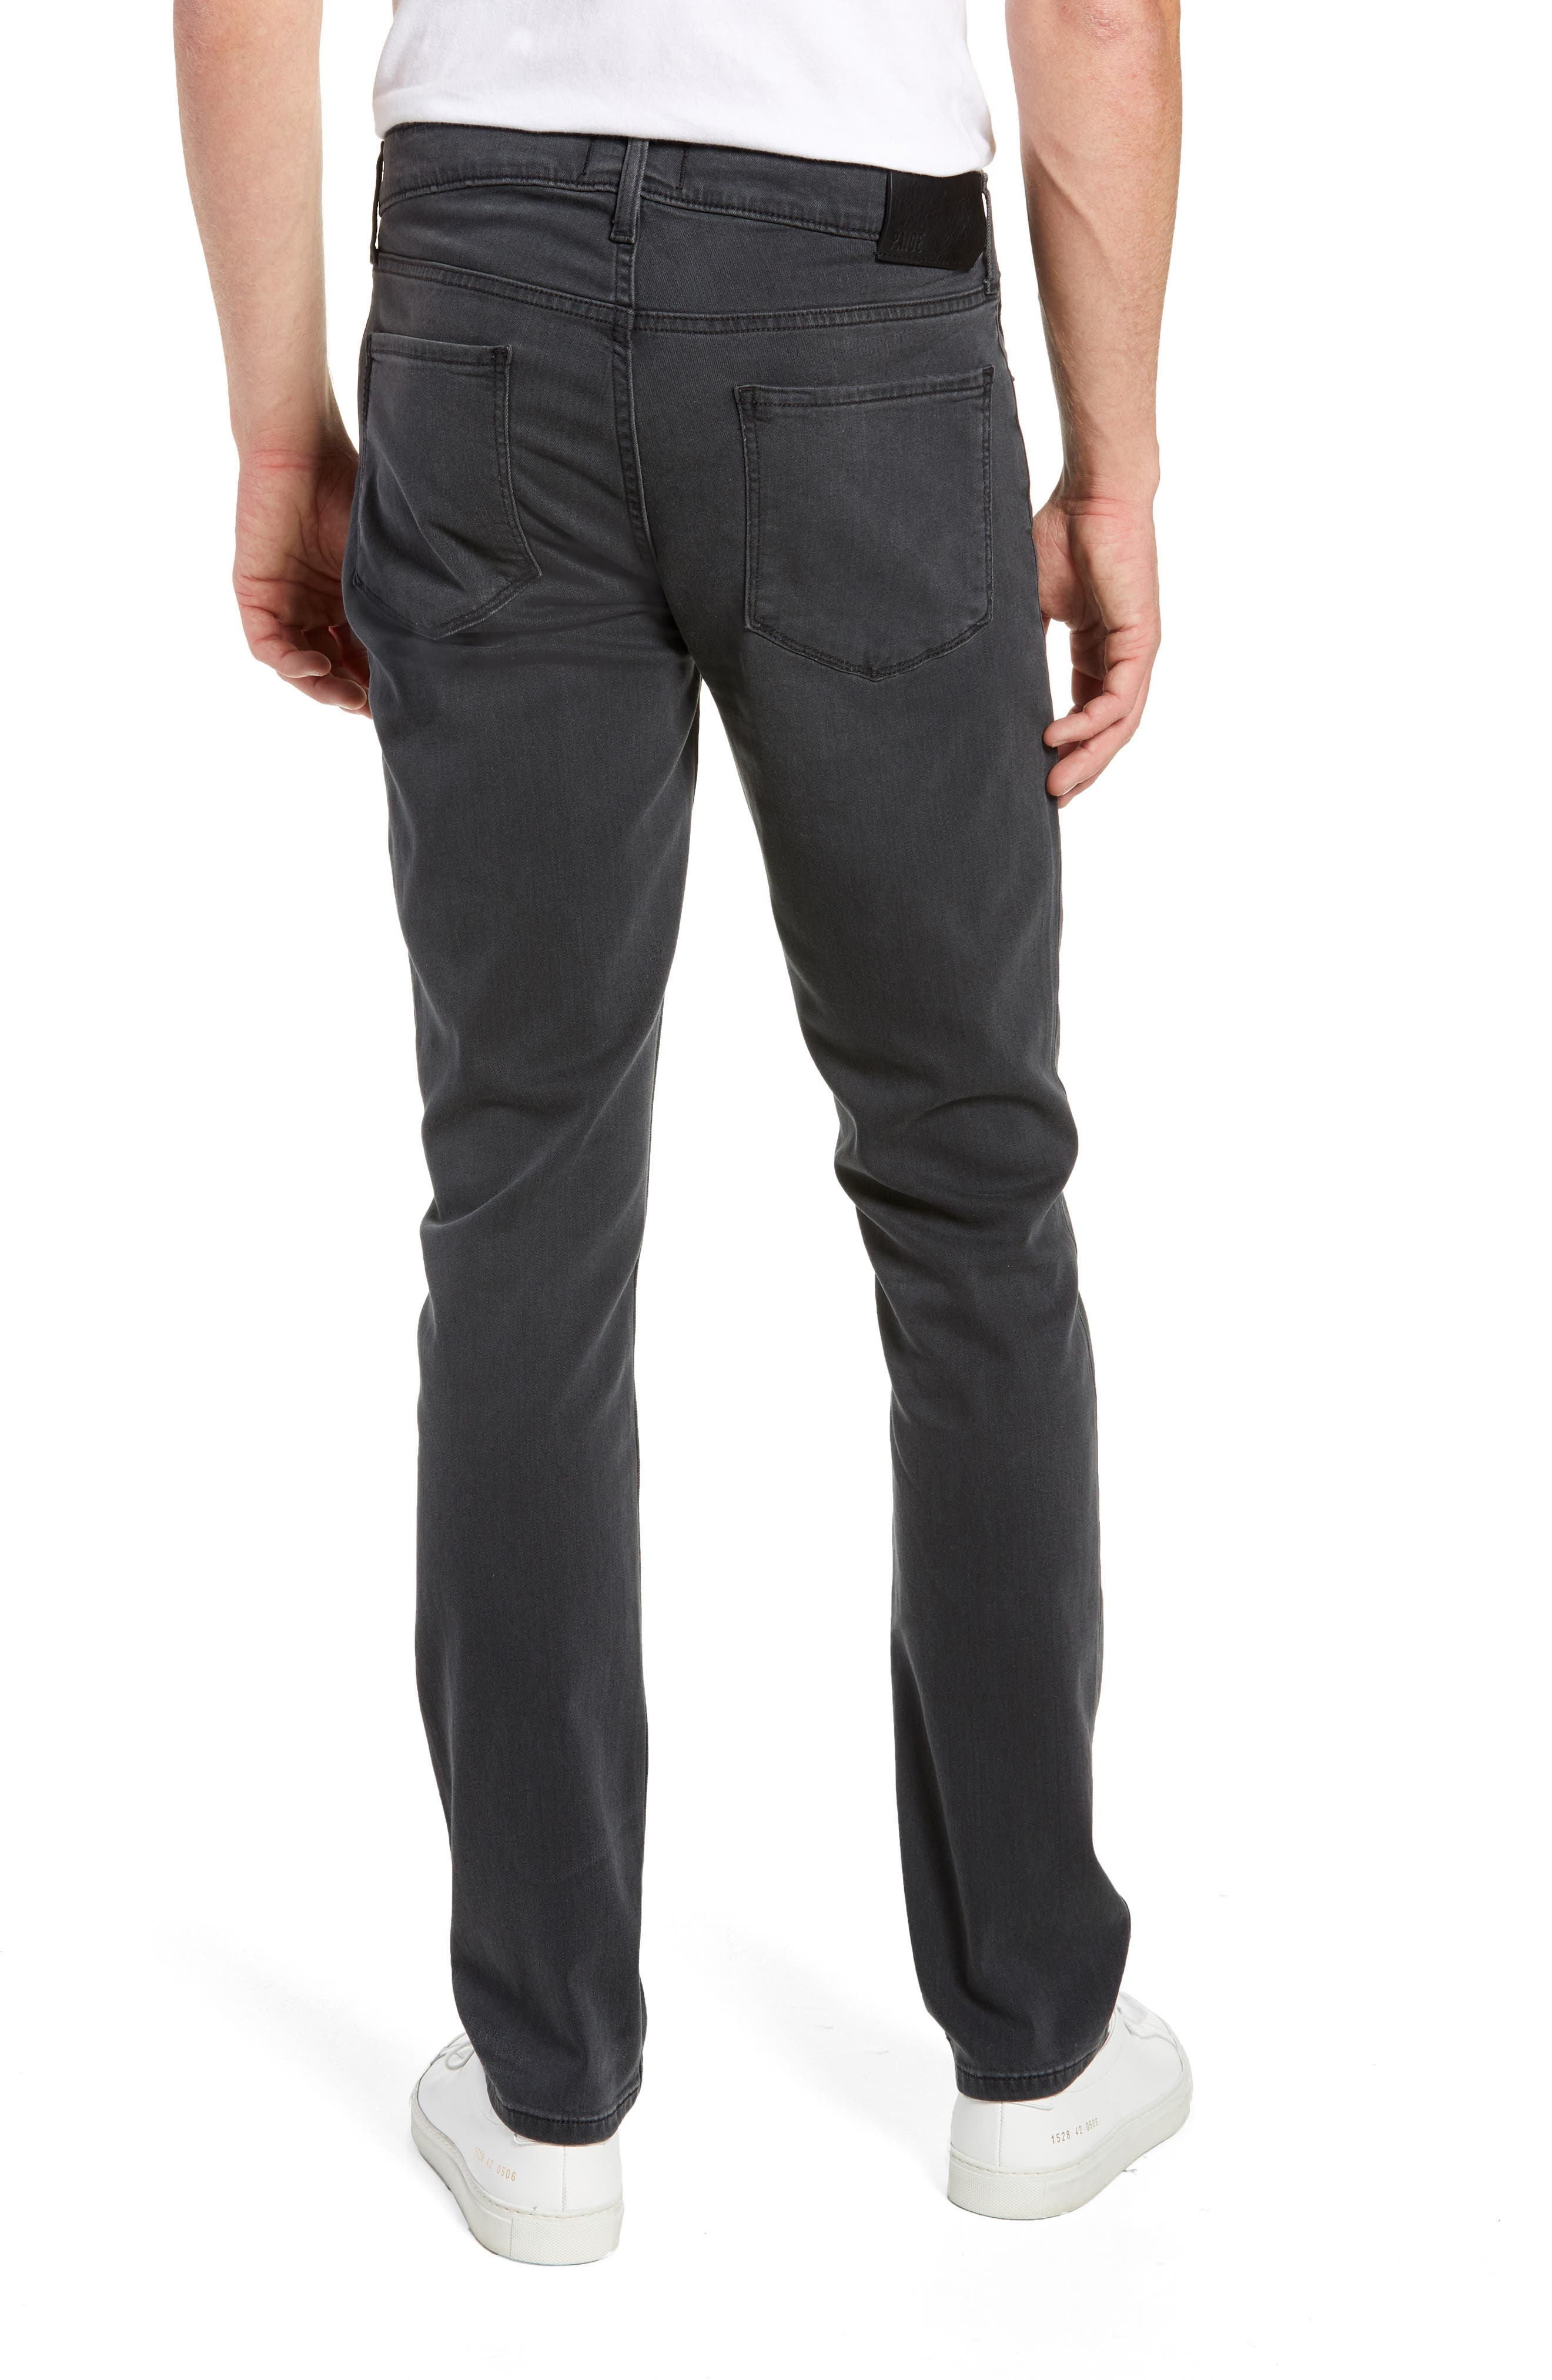 Transcend - Lennox Slim Fit Jeans,                             Alternate thumbnail 2, color,                             SHELDON